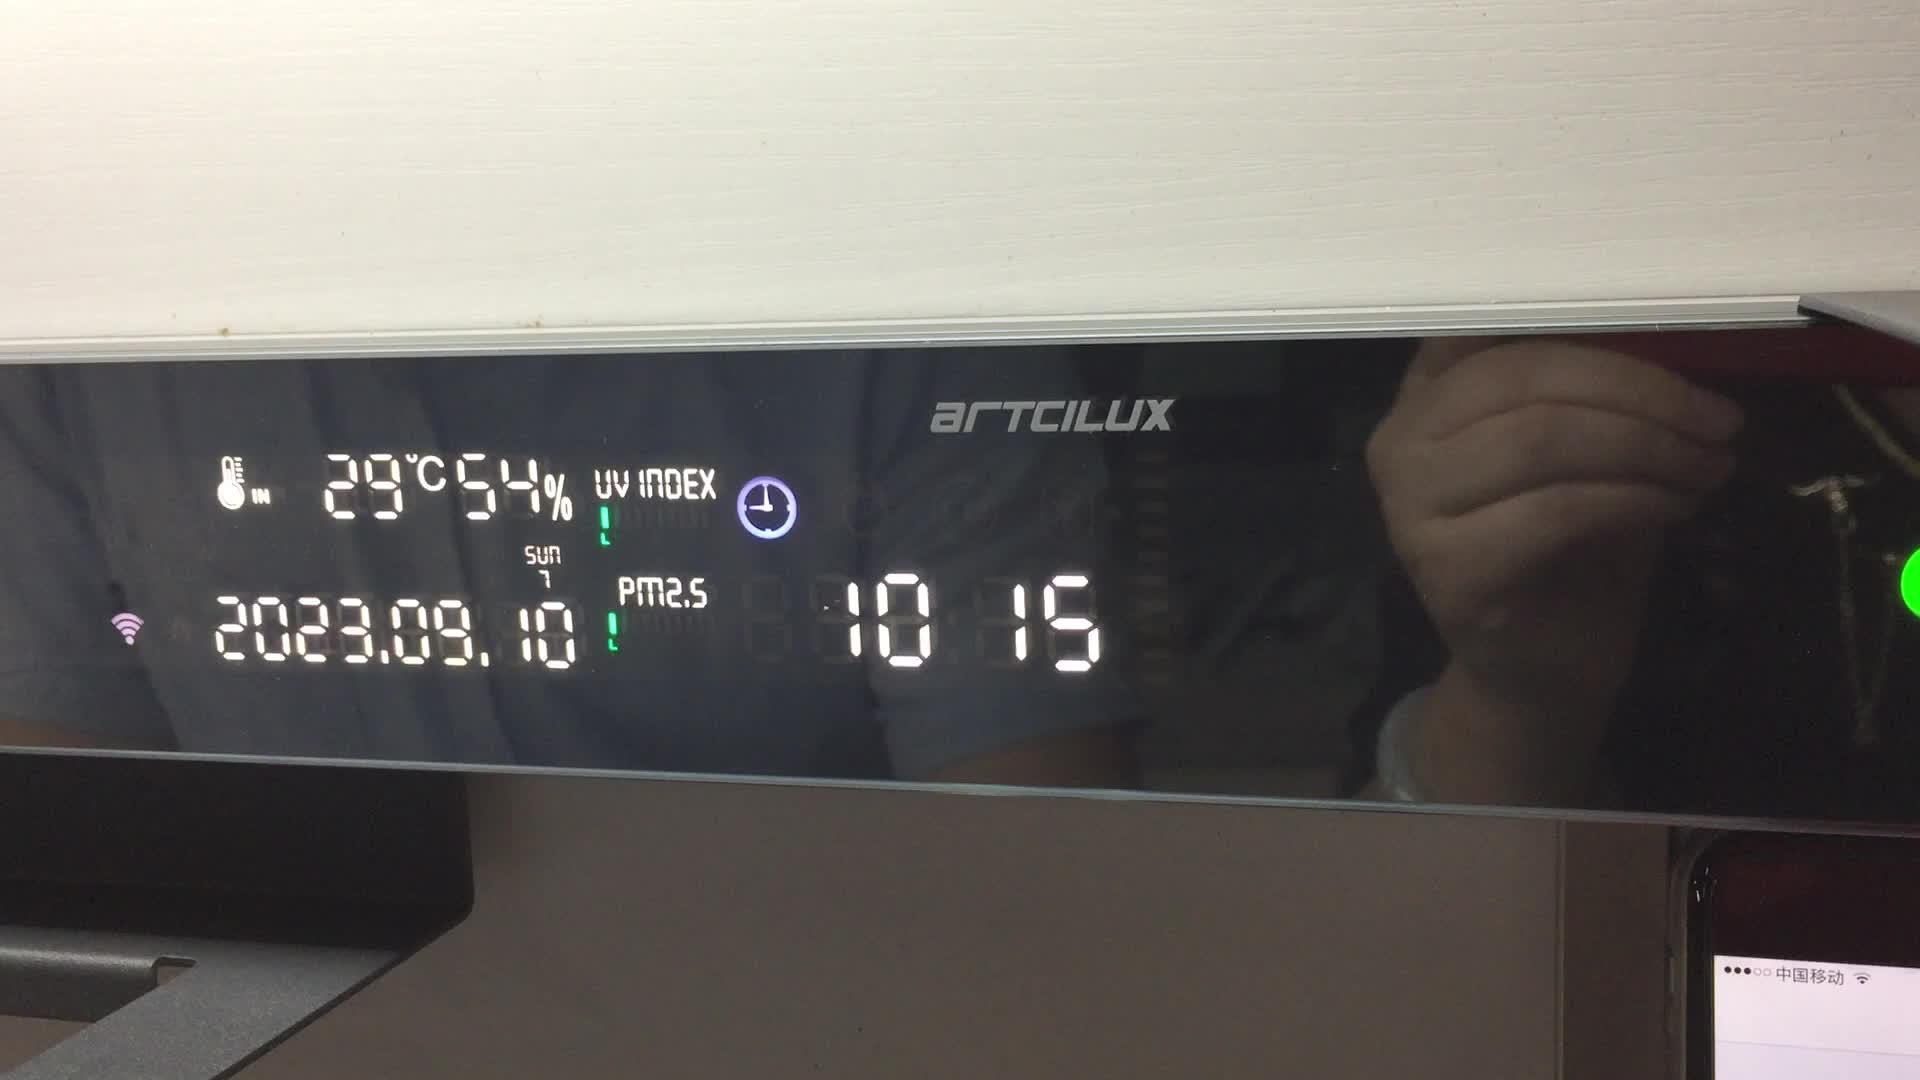 A5151 Smart led display Screen two power socket usb port use kitchen light